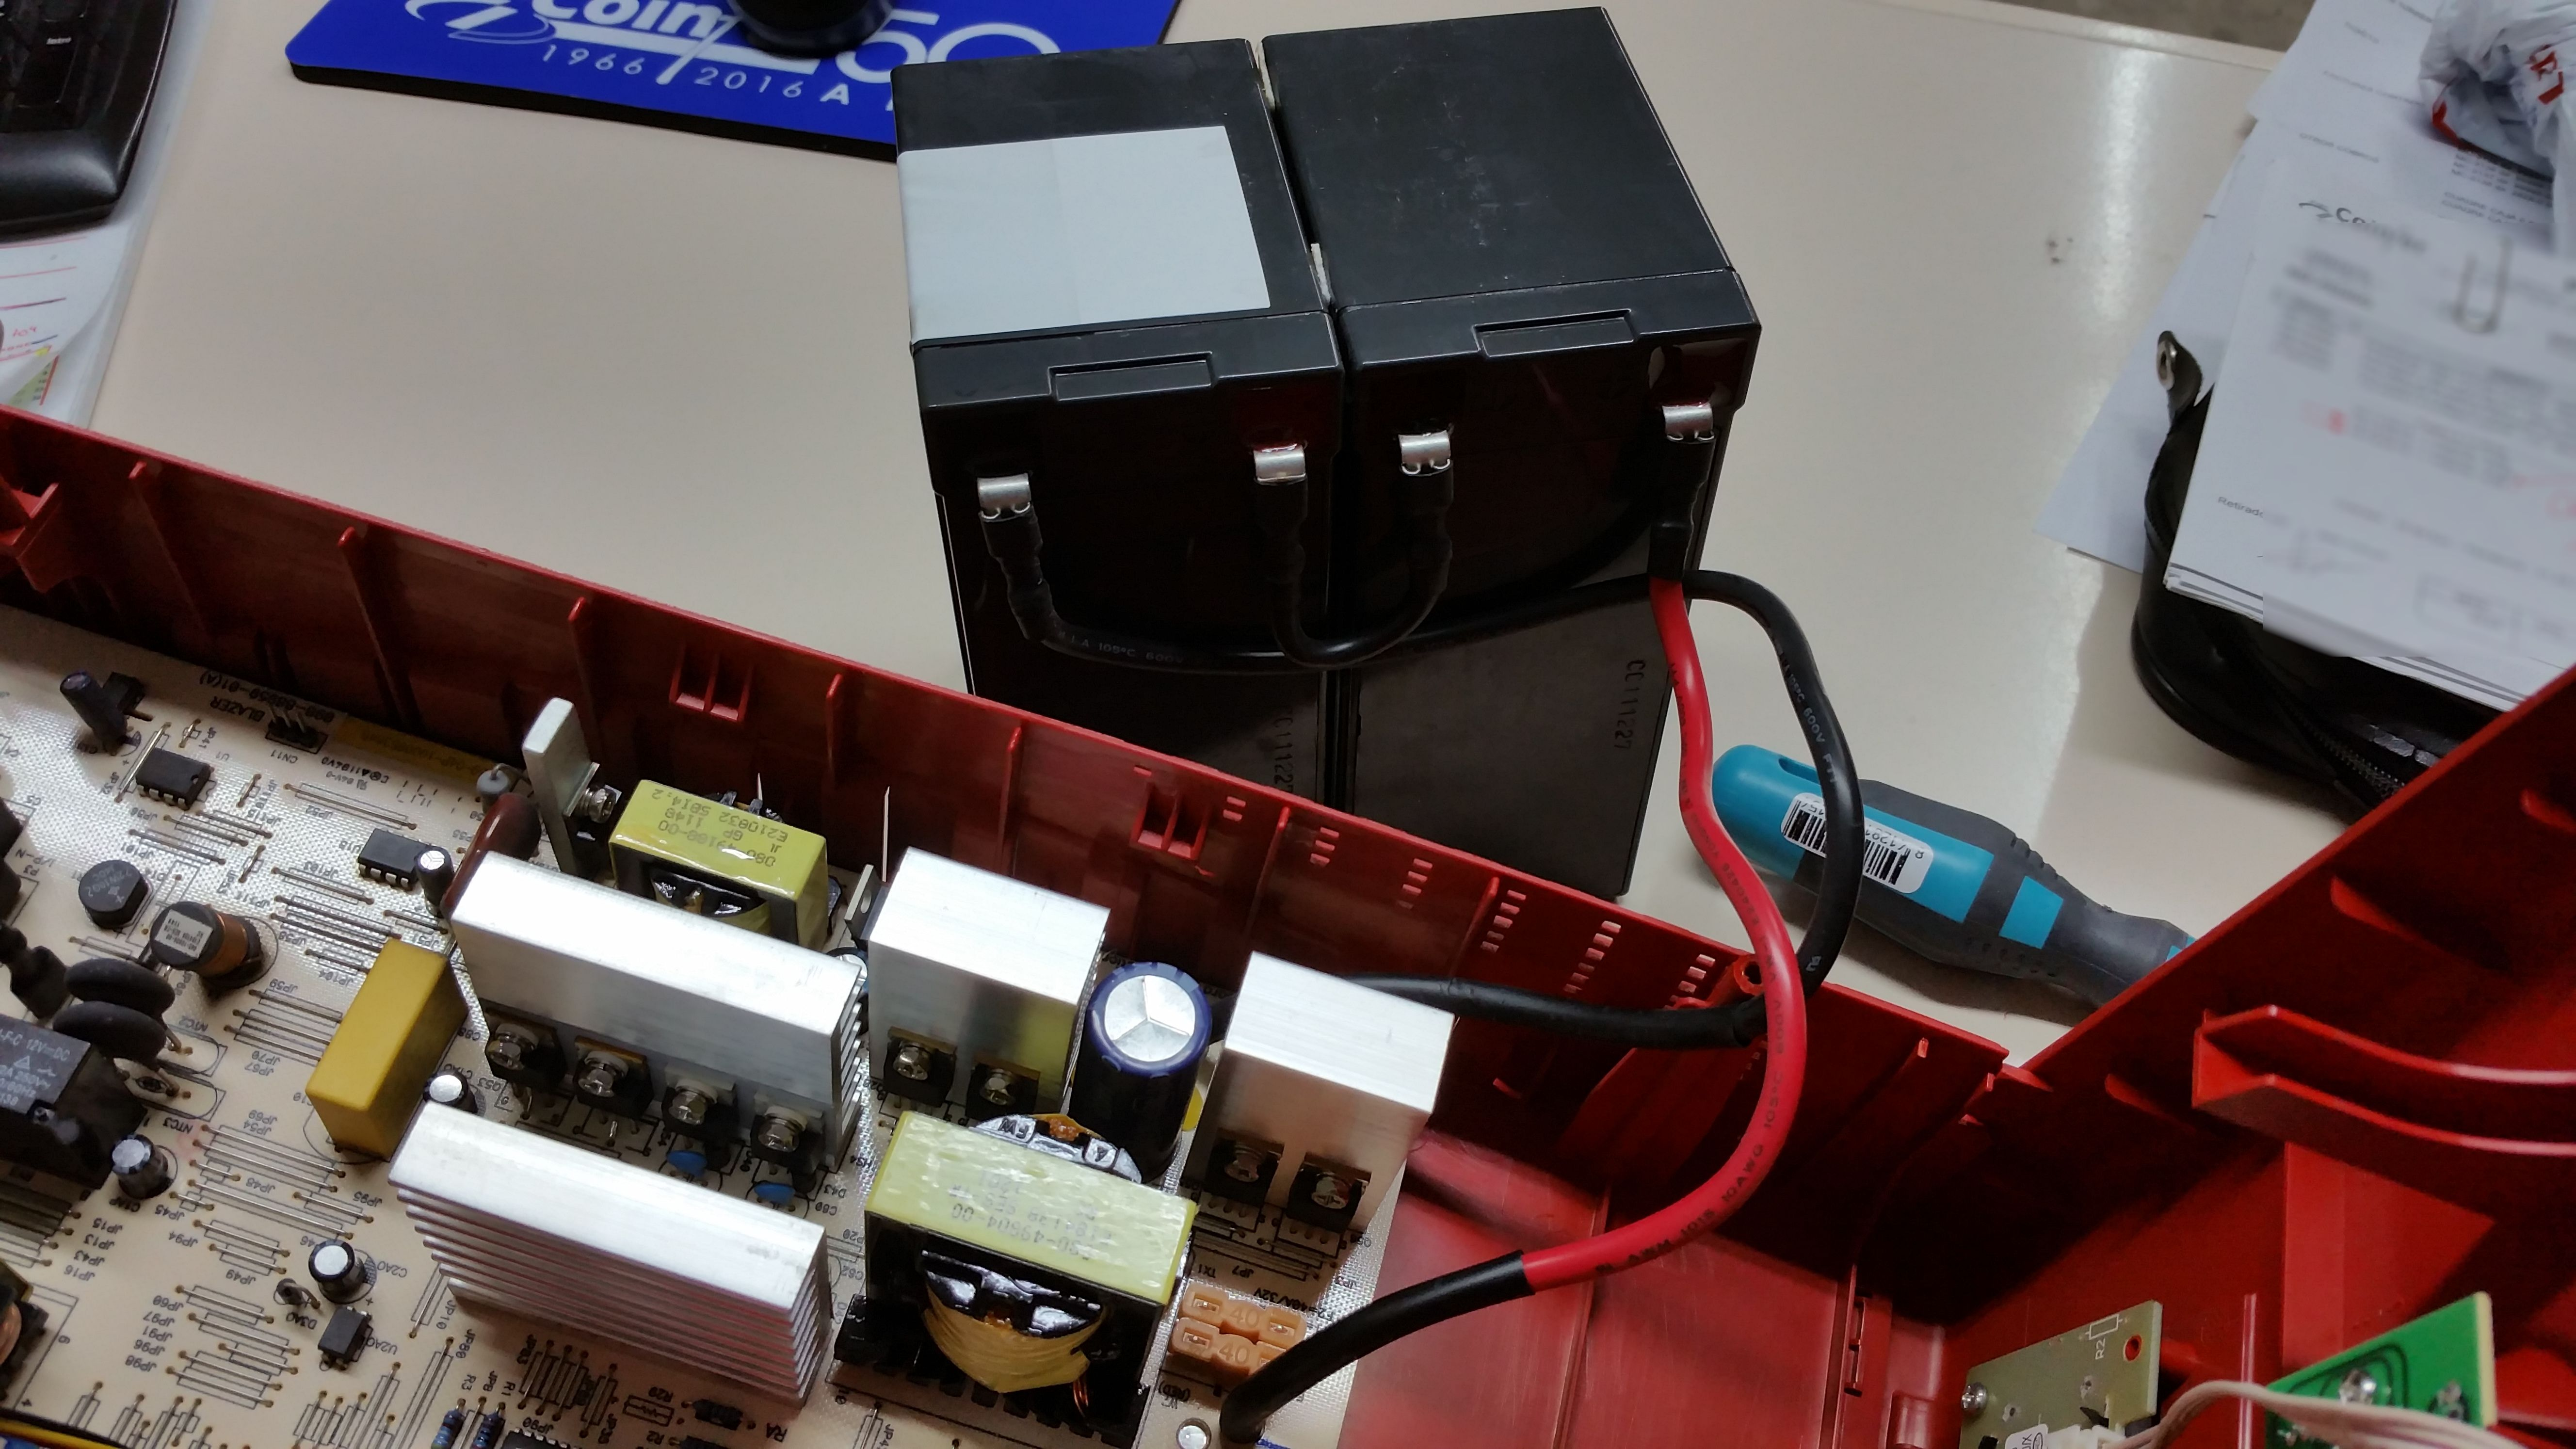 Vista interior de un SAI de informática. Usa dos baterías de plomo ácido de 12V y 7Ah.